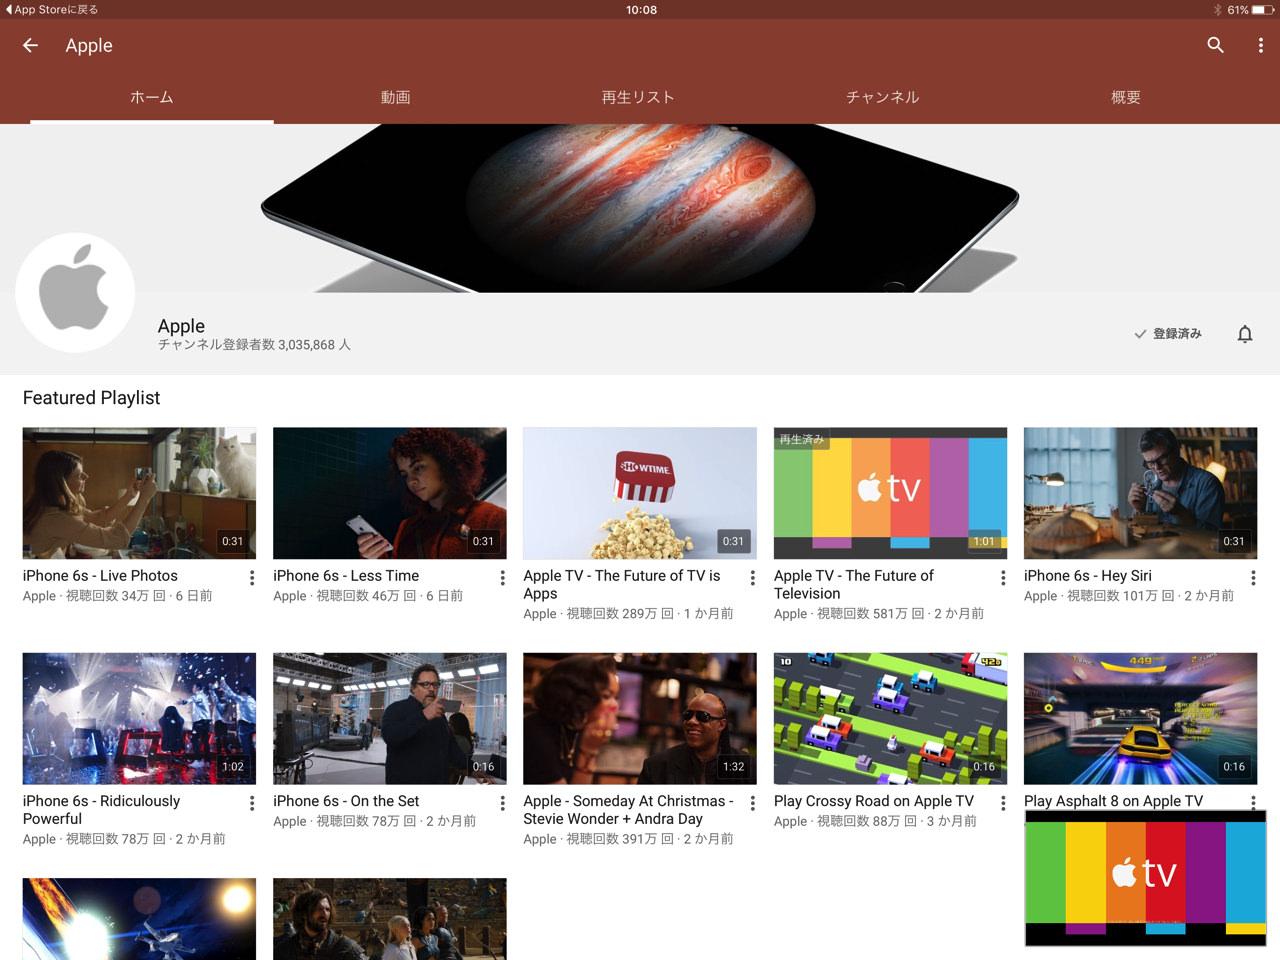 Ios app youtube corresponding to resolution of ipad pro3